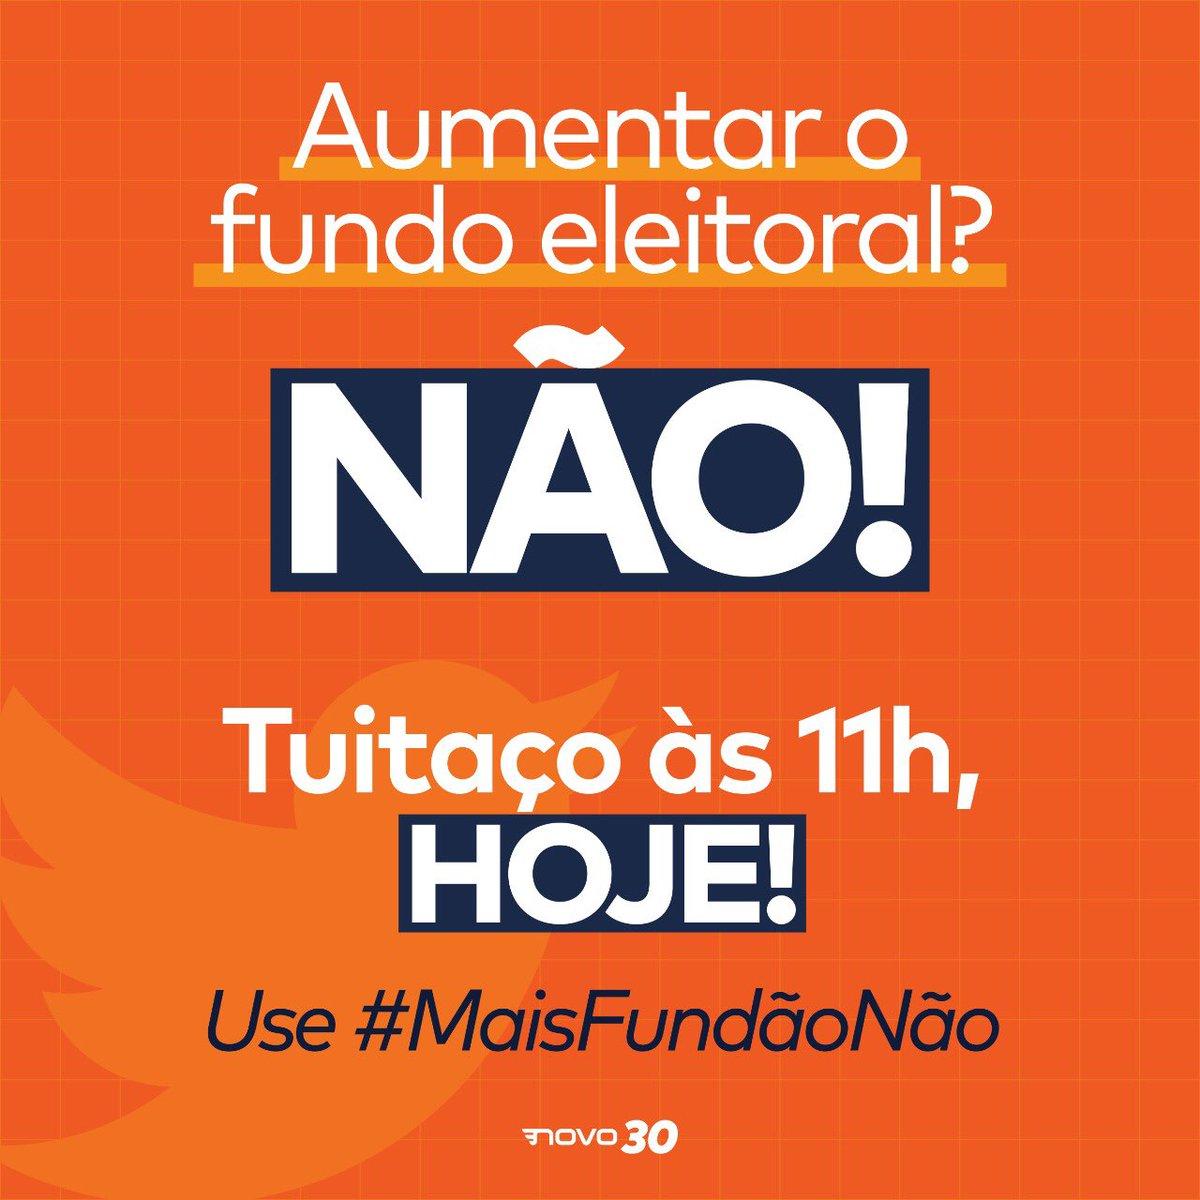 Absurdo #MaisFundaoNao <br>http://pic.twitter.com/6RINT5iaR0